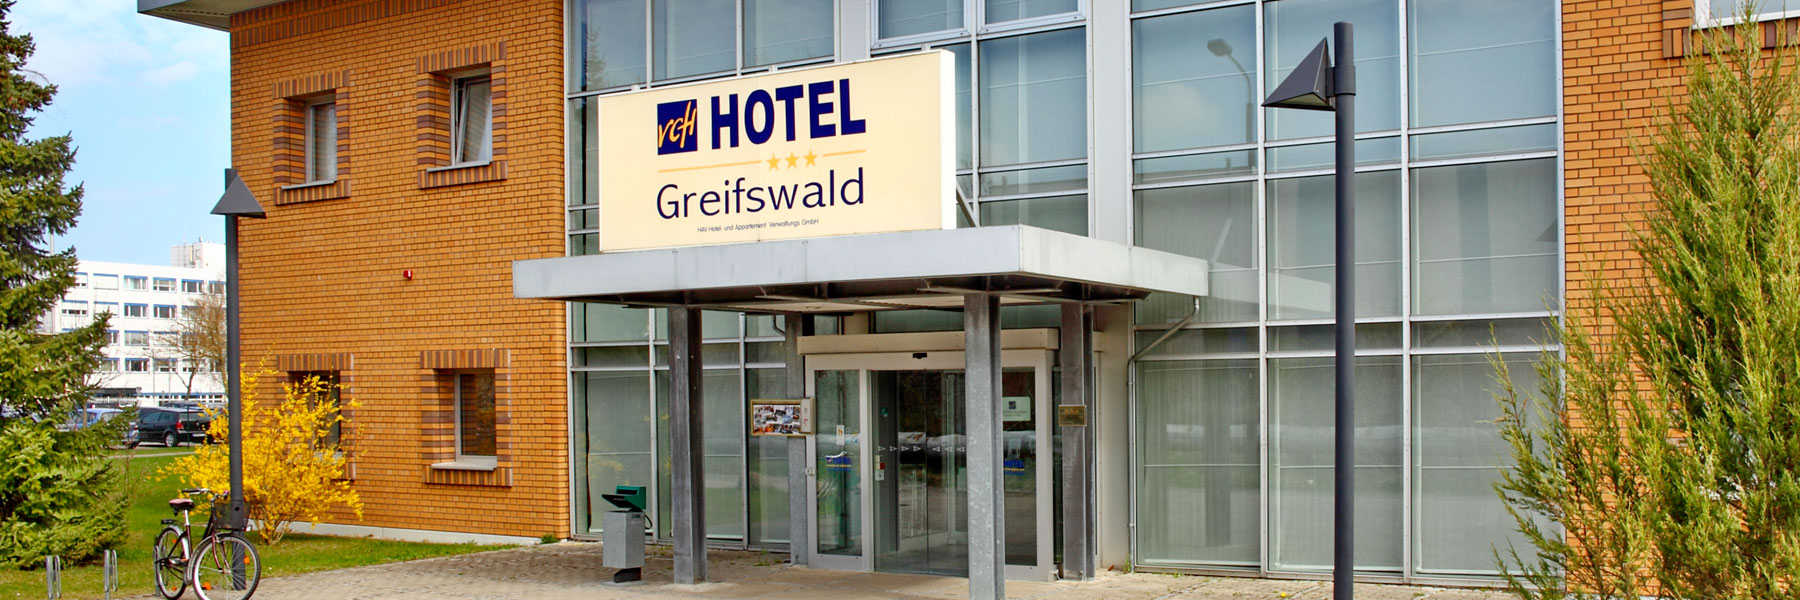 Hoteleingang - VCH-Hotel Greifswald